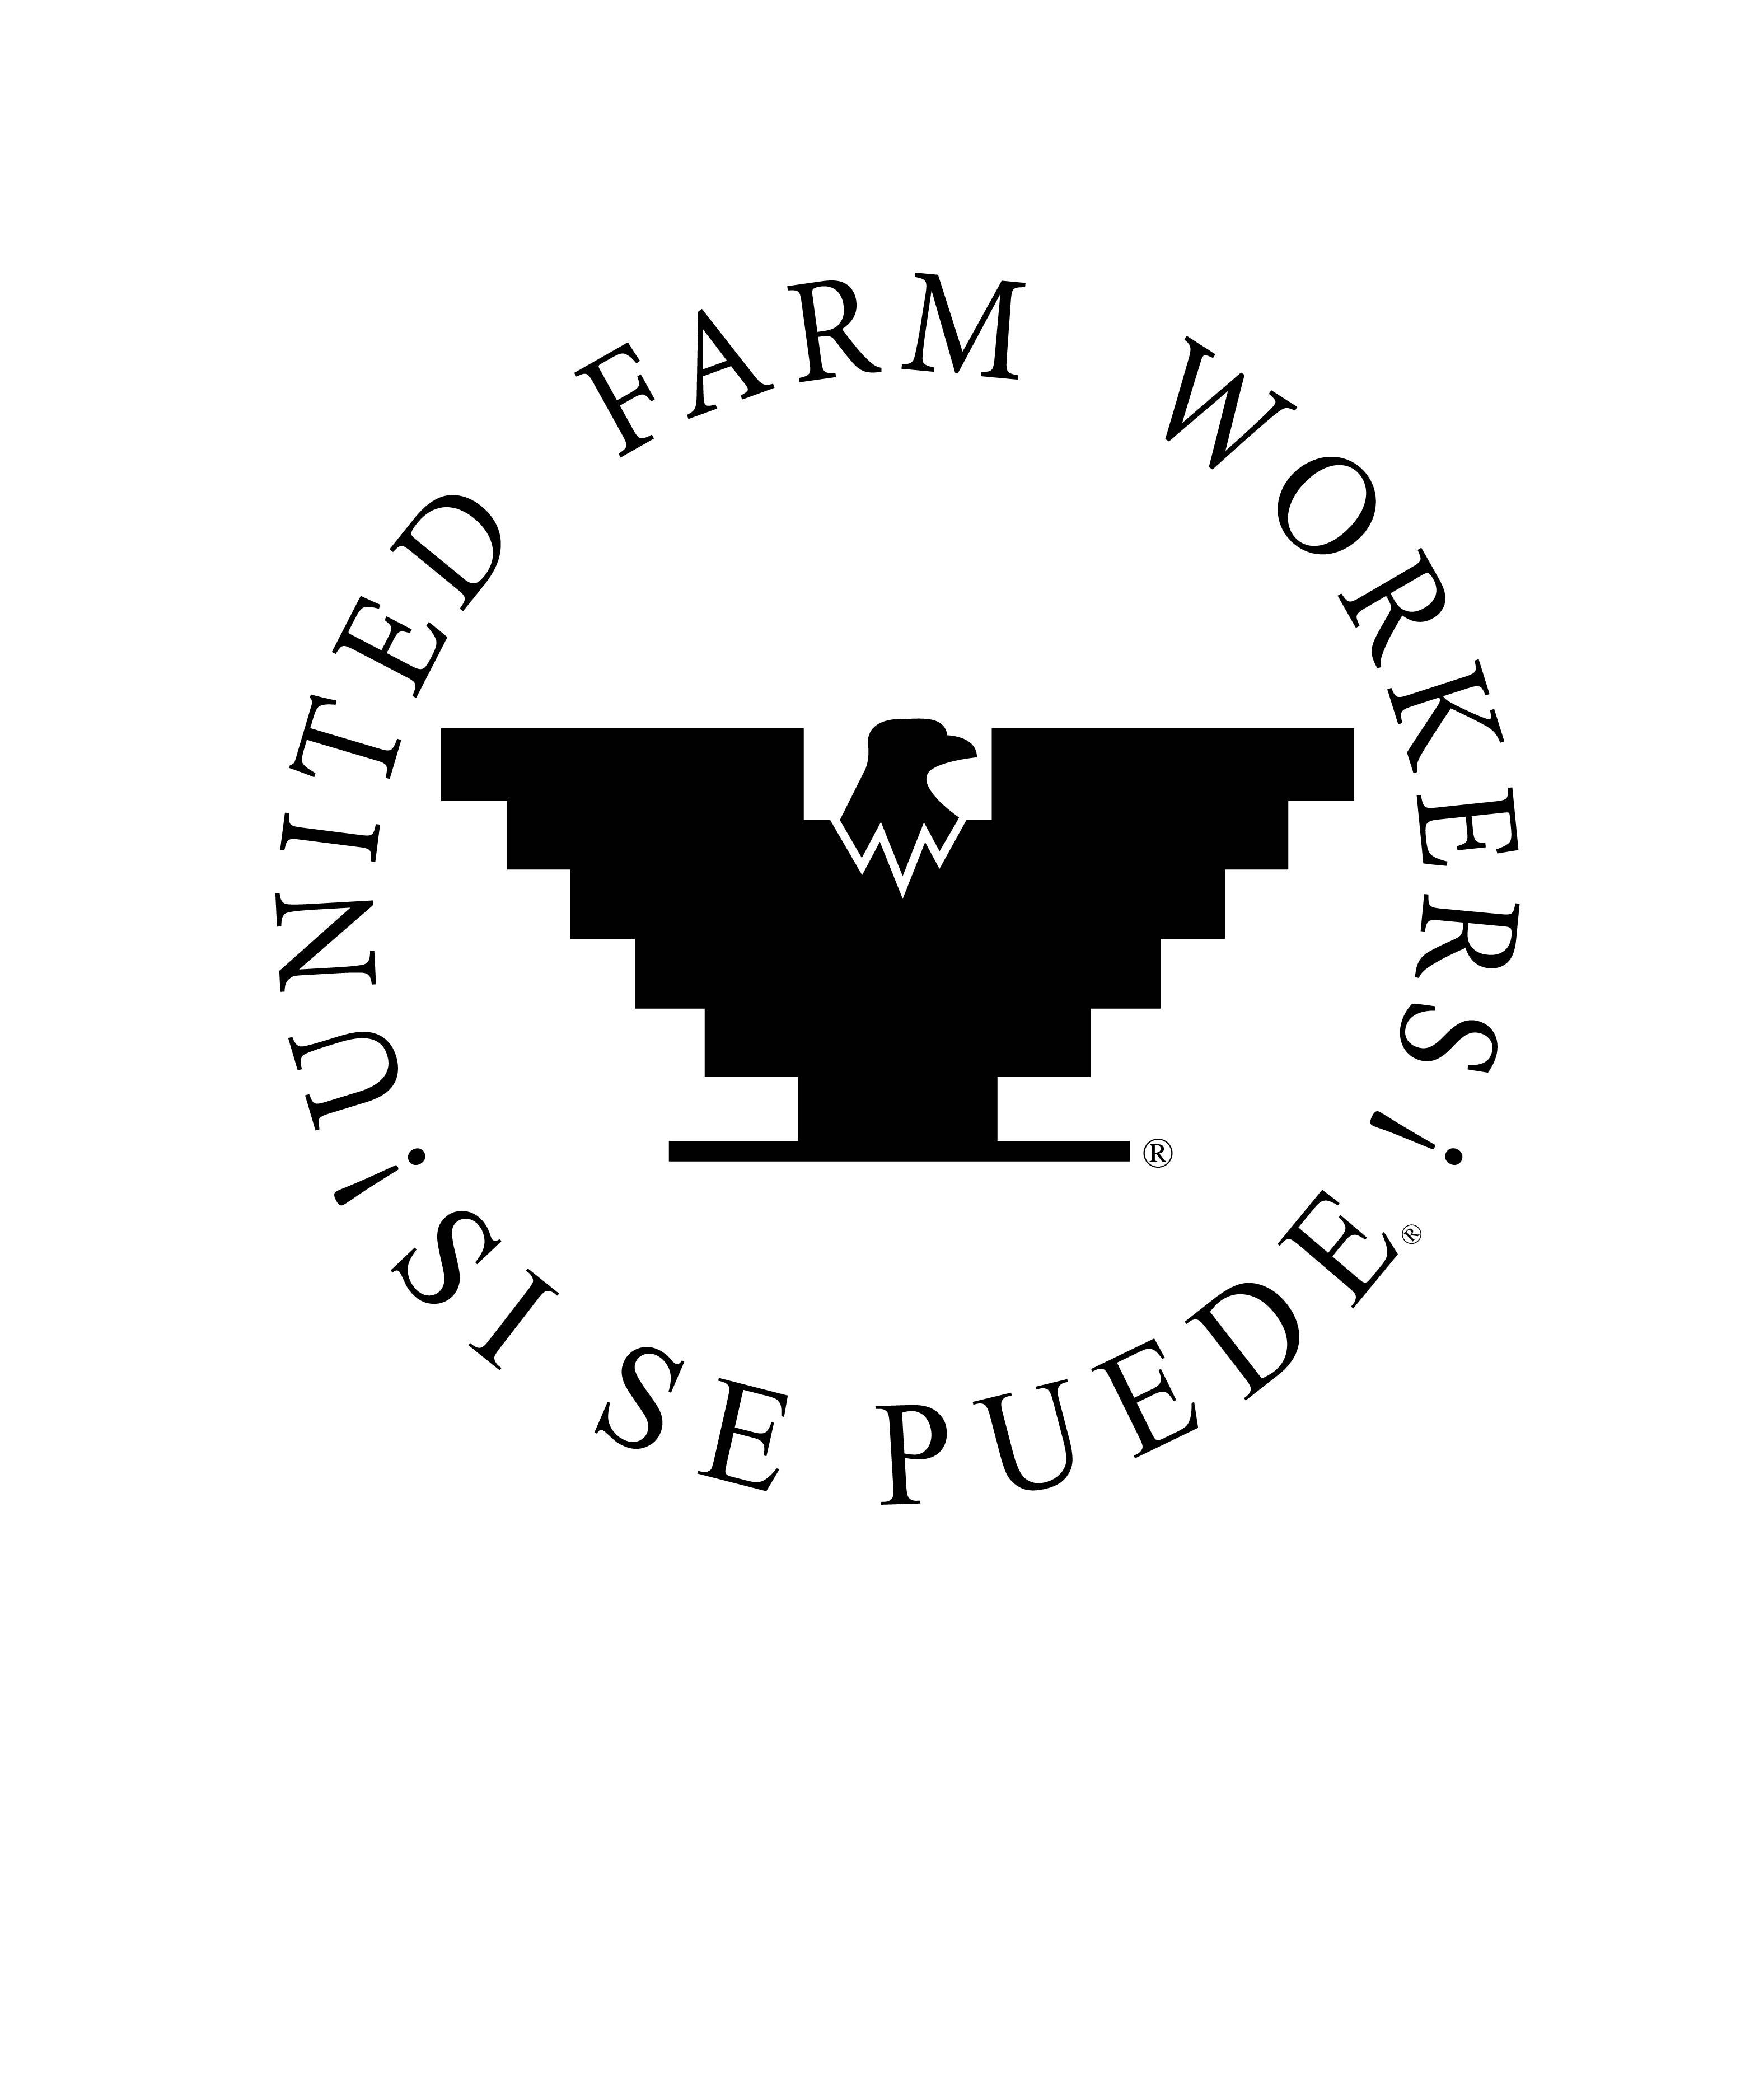 United Farm Workers | Ecological Farming Association